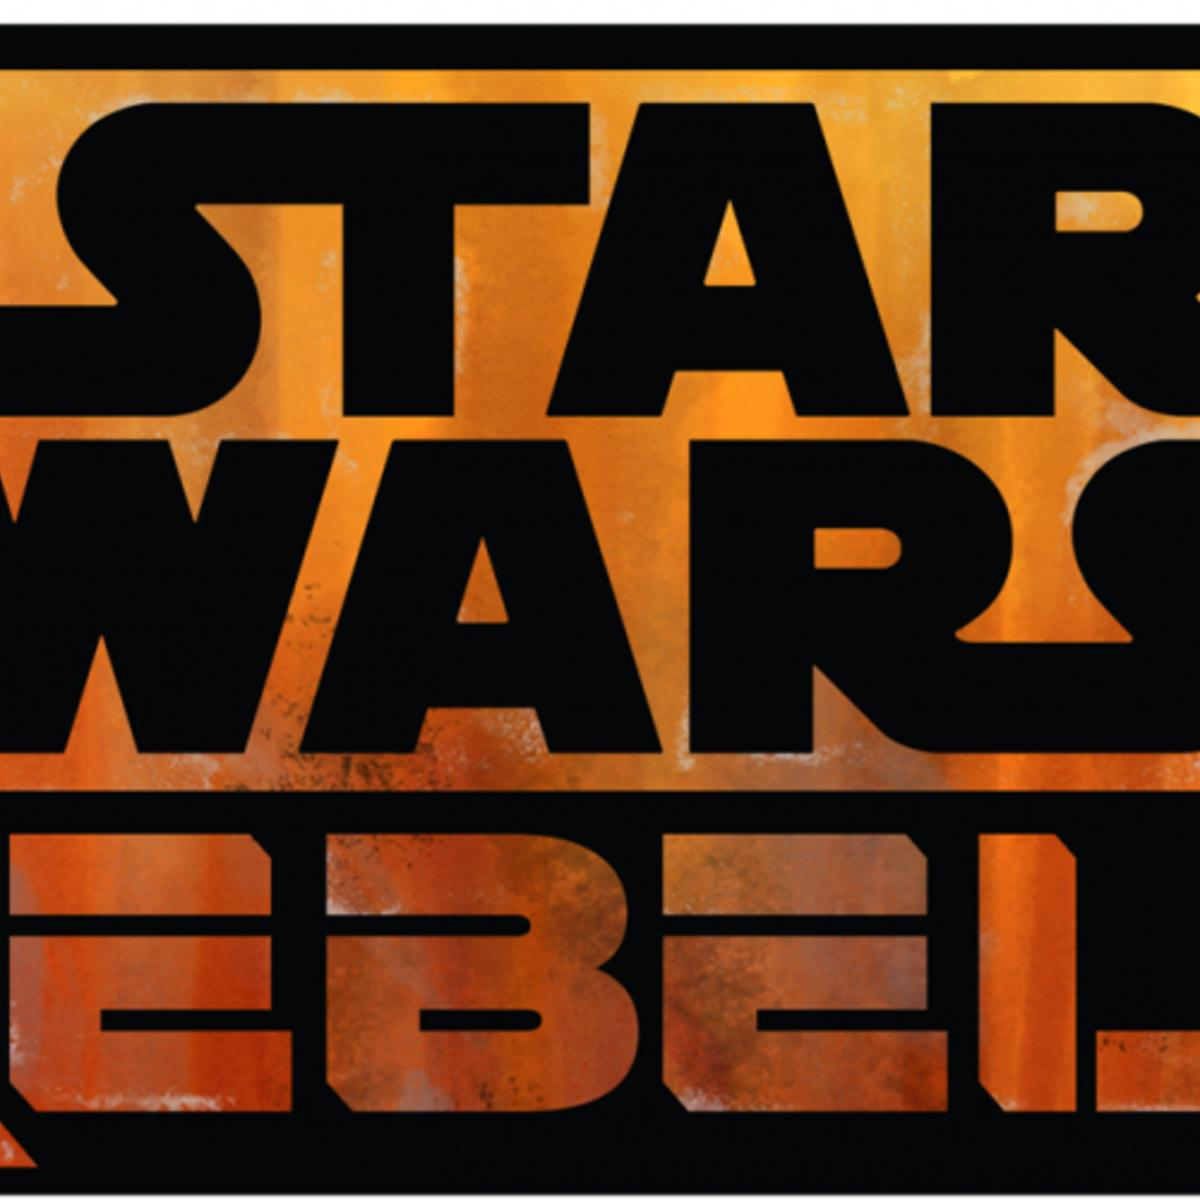 Star-Wars-Rebels-Logo.png